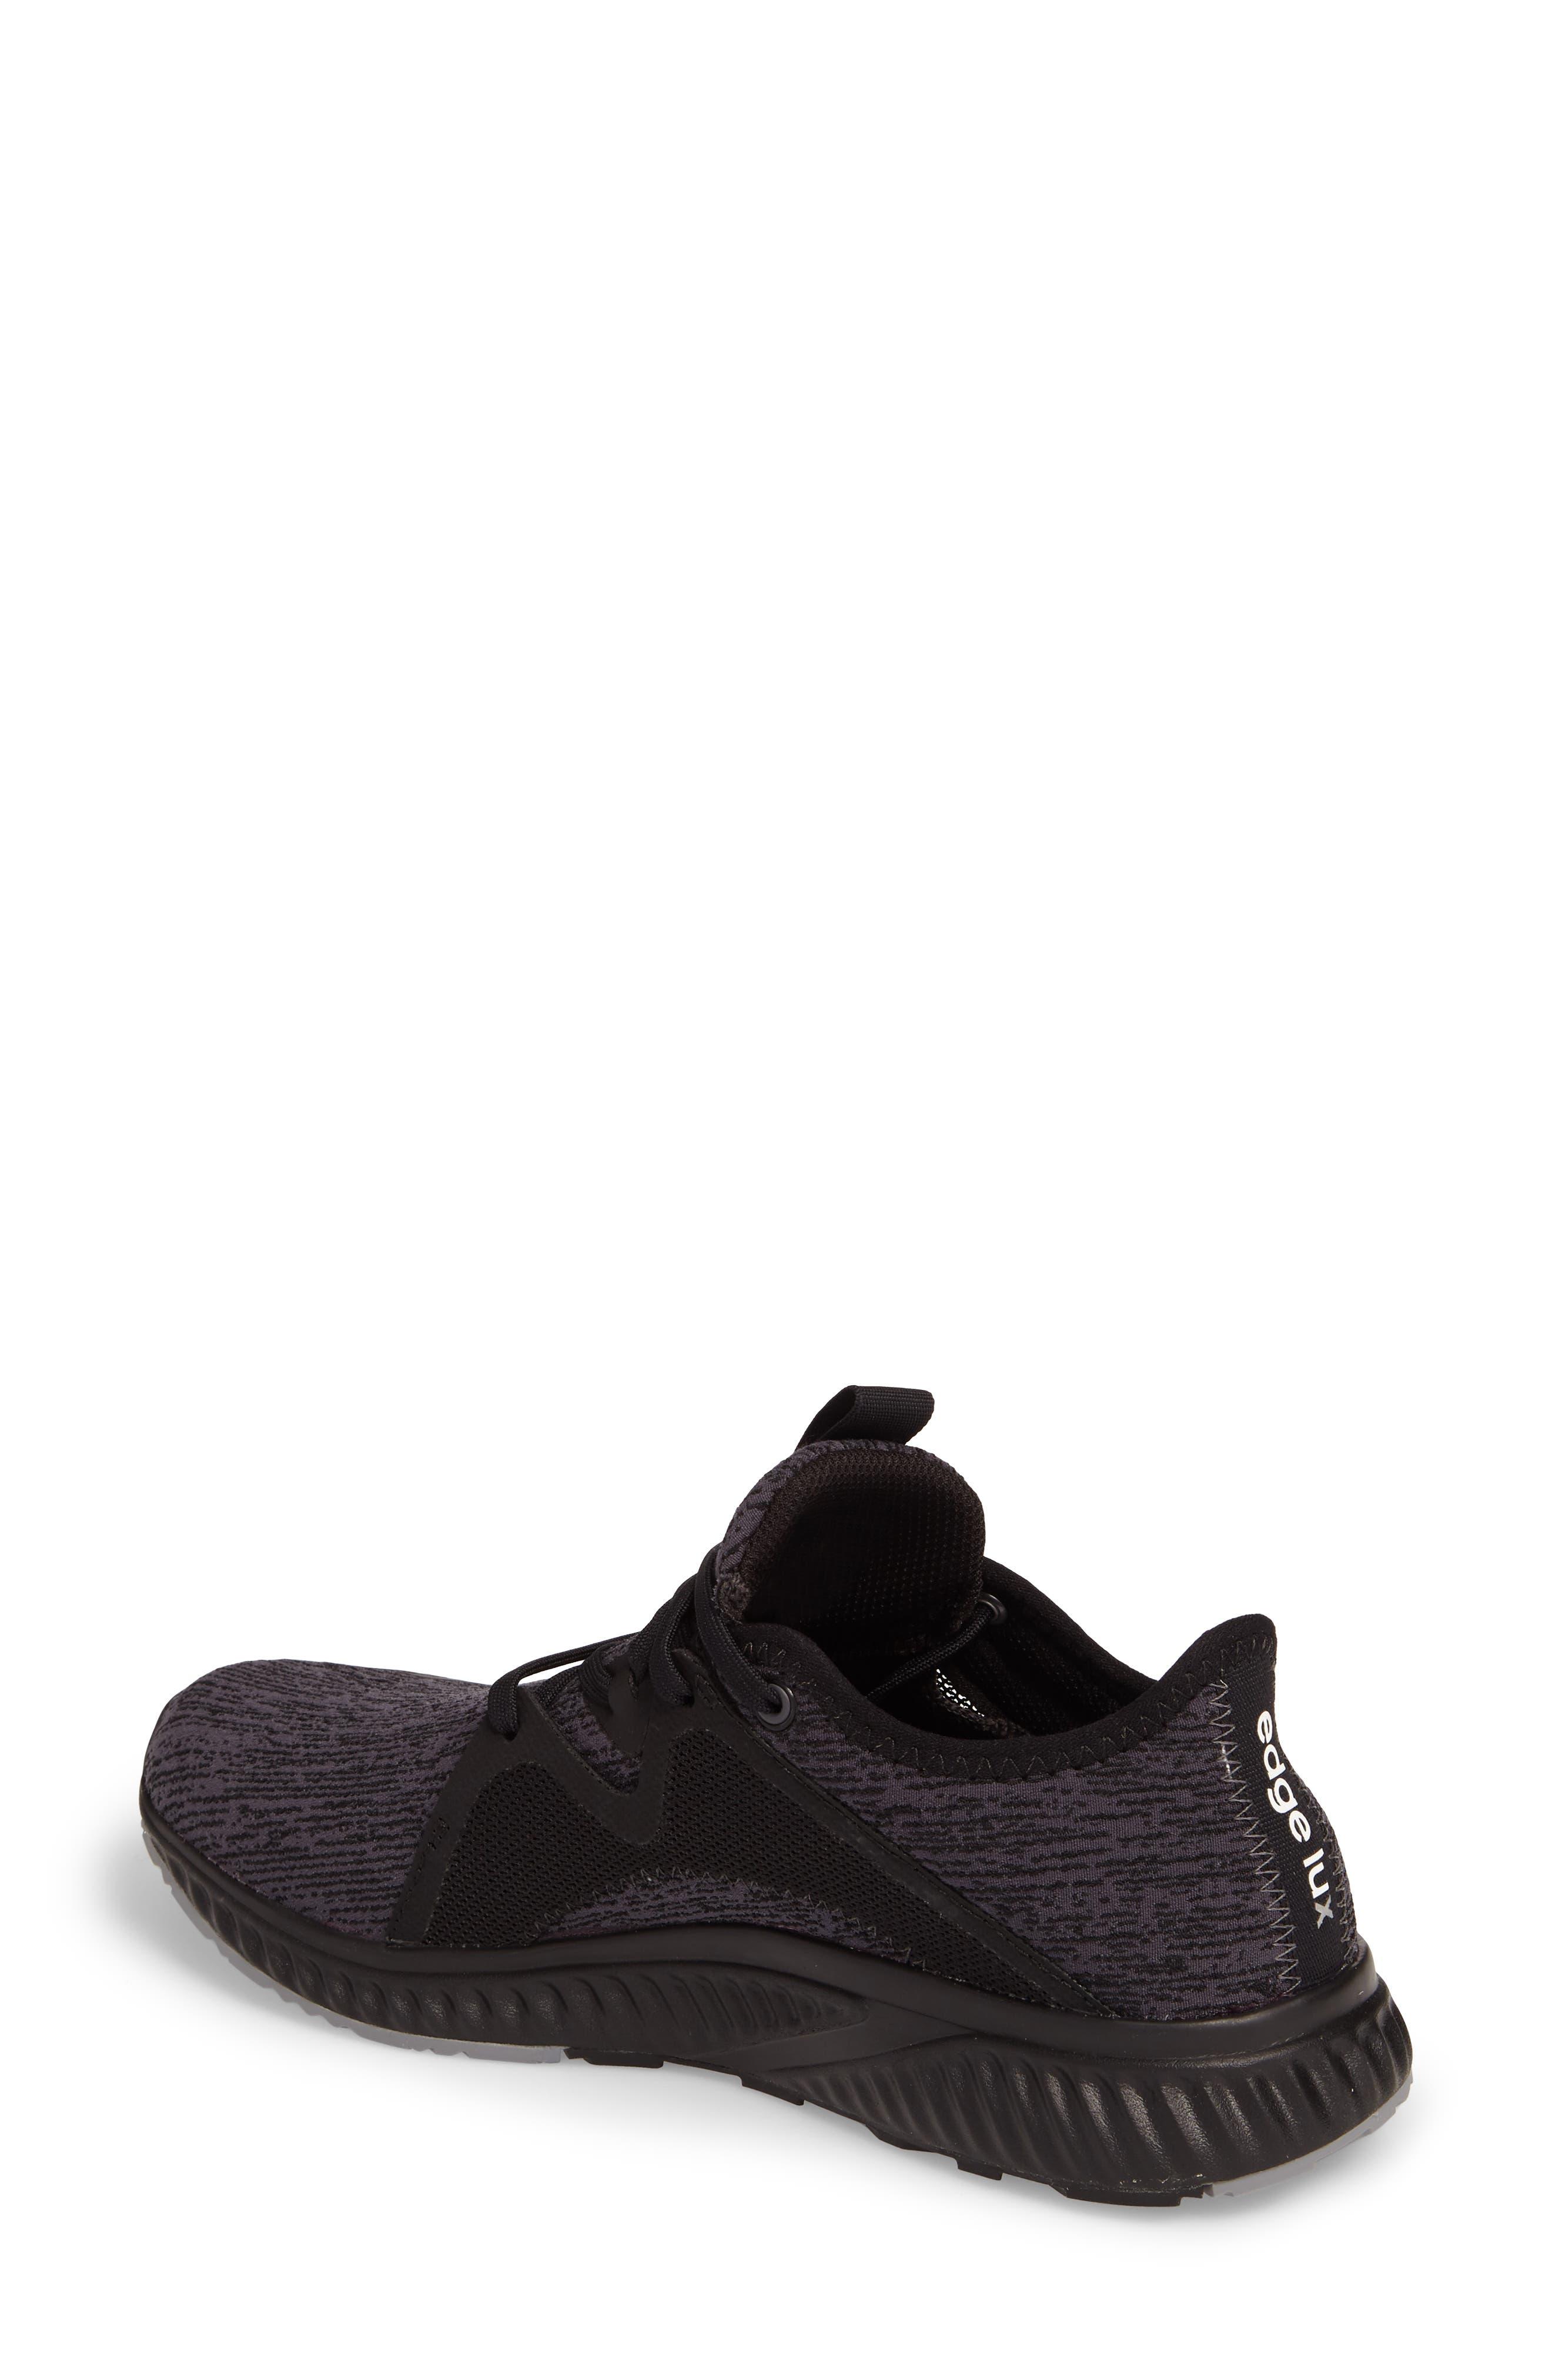 Alternate Image 2  - adidas Edge Lux 2.0 Running Shoe (Women)